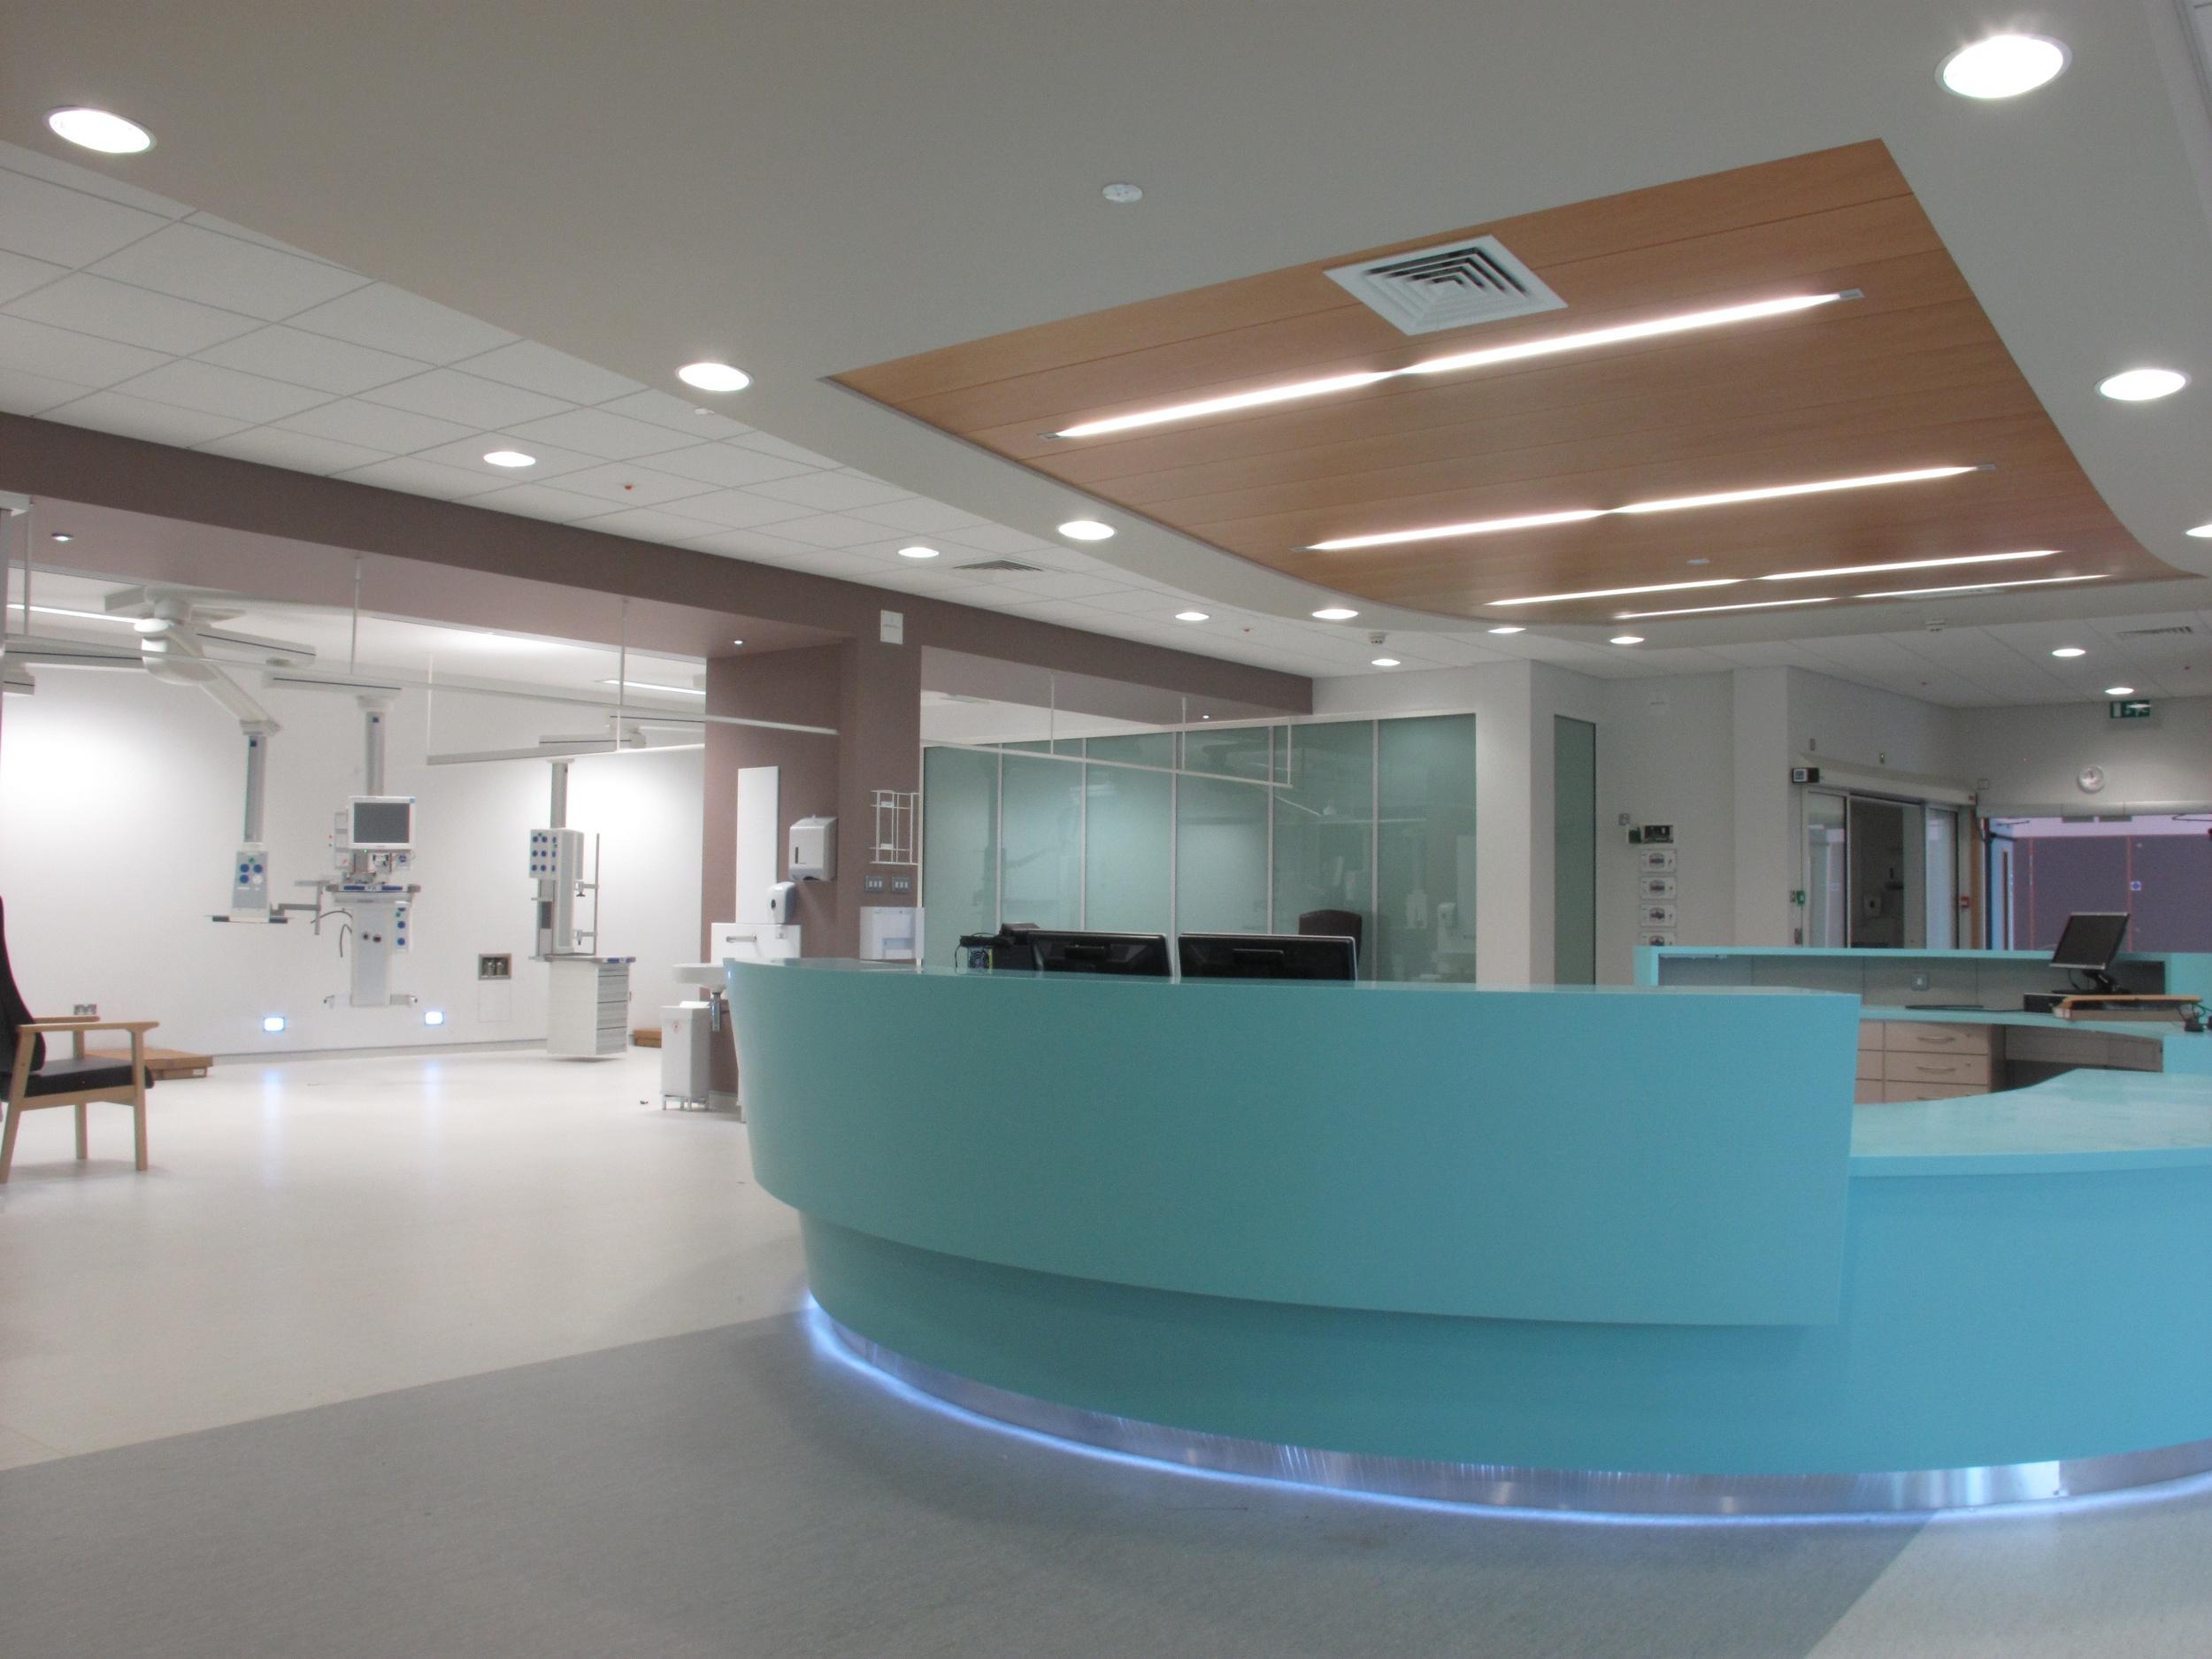 U lster Hospital,New Theatres, nurses station